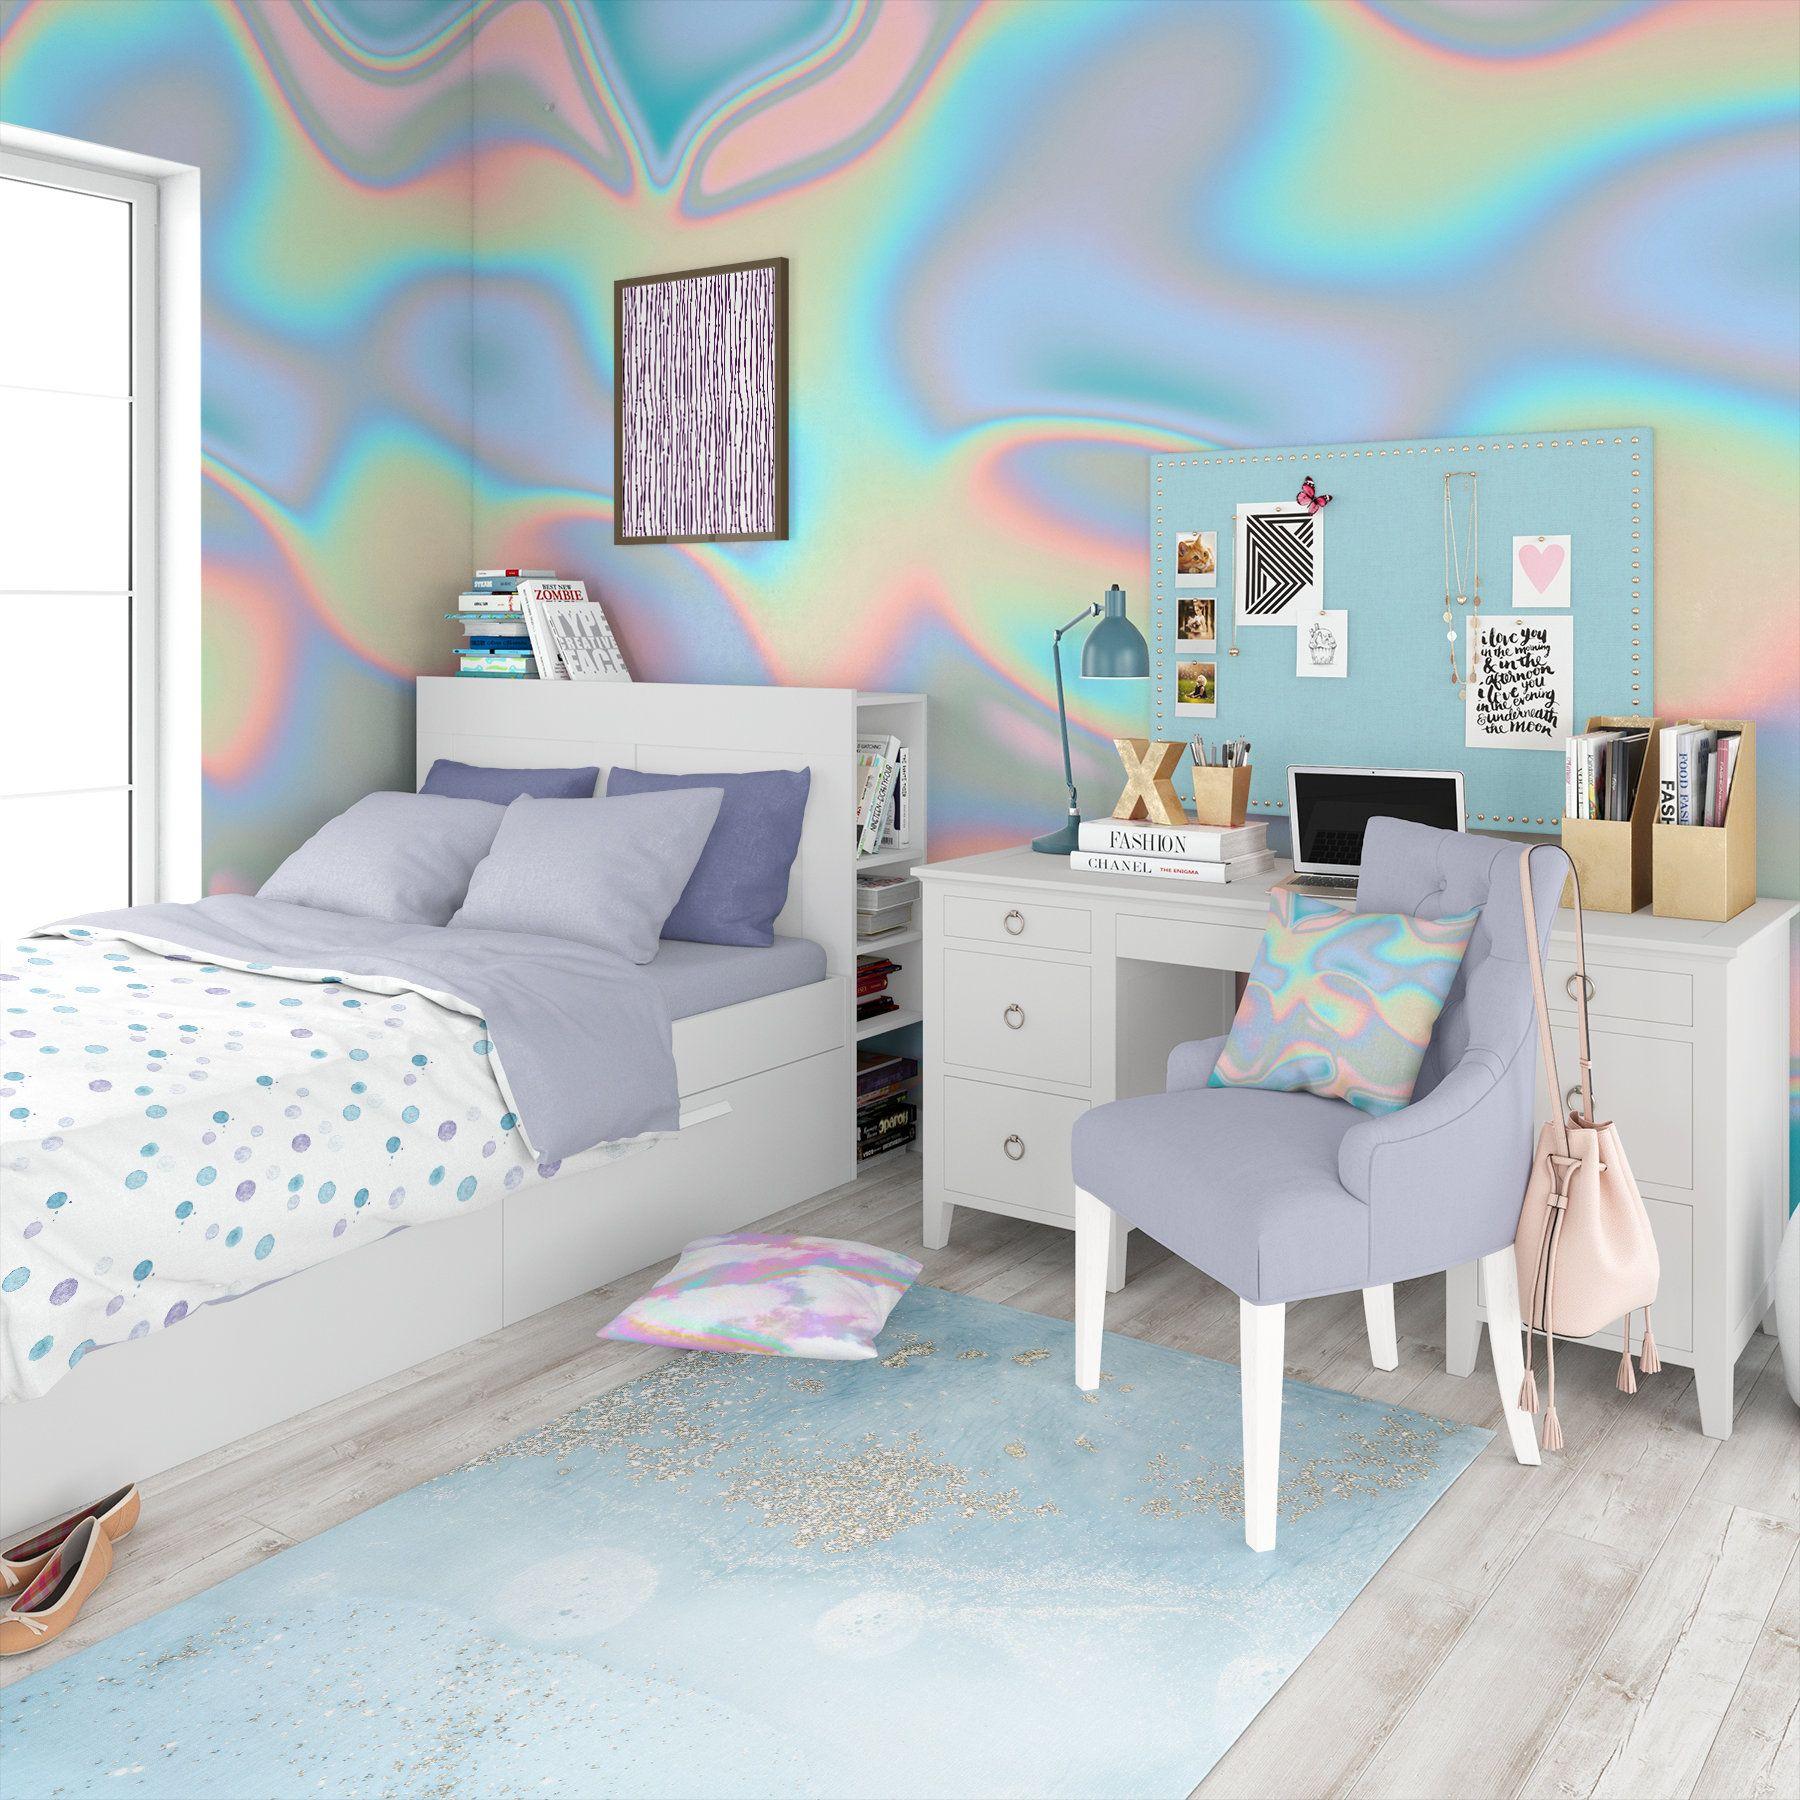 Peel And Stick Wallpaper Self Adhesive Wallpaper Removable Etsy In 2021 Peel And Stick Wallpaper Wallpaper Walls Decor Self Adhesive Wallpaper